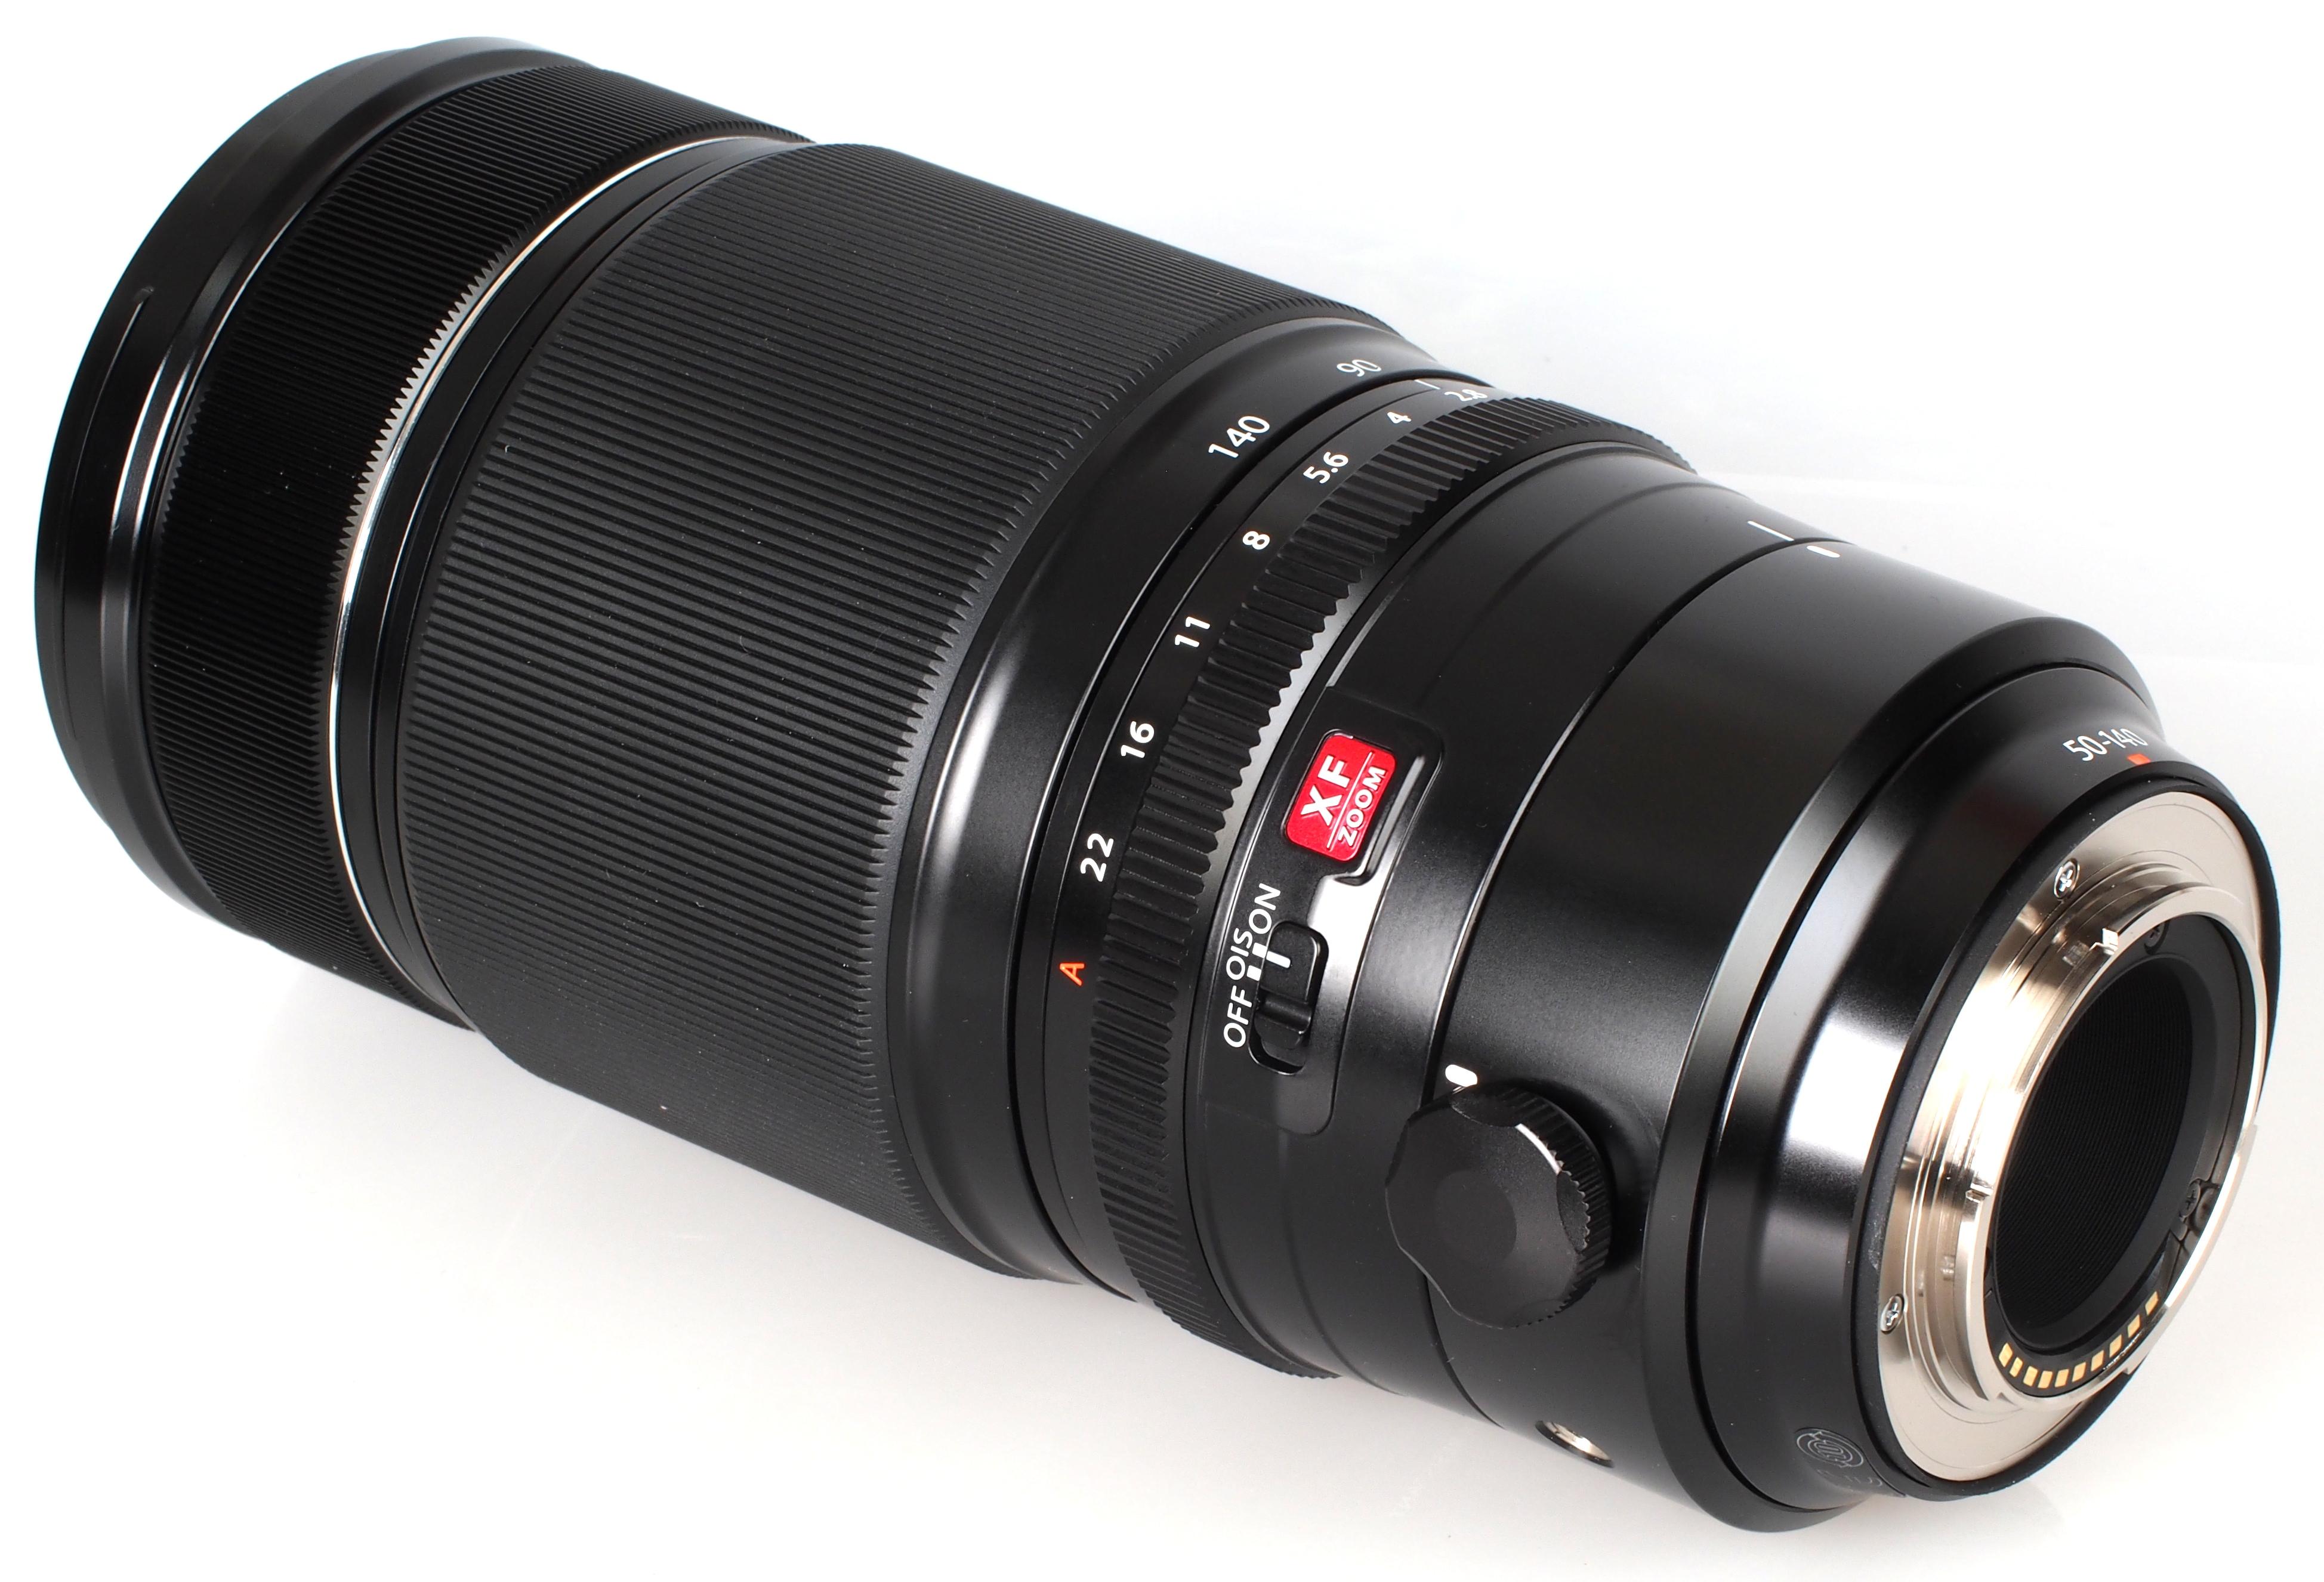 Top 13 Best Fujifilm Lenses Reviewed 2018 X T100 Body Xf35mm F2 Black Kamera Mirrorless Fujinon Xf 50 140mm Lens 6